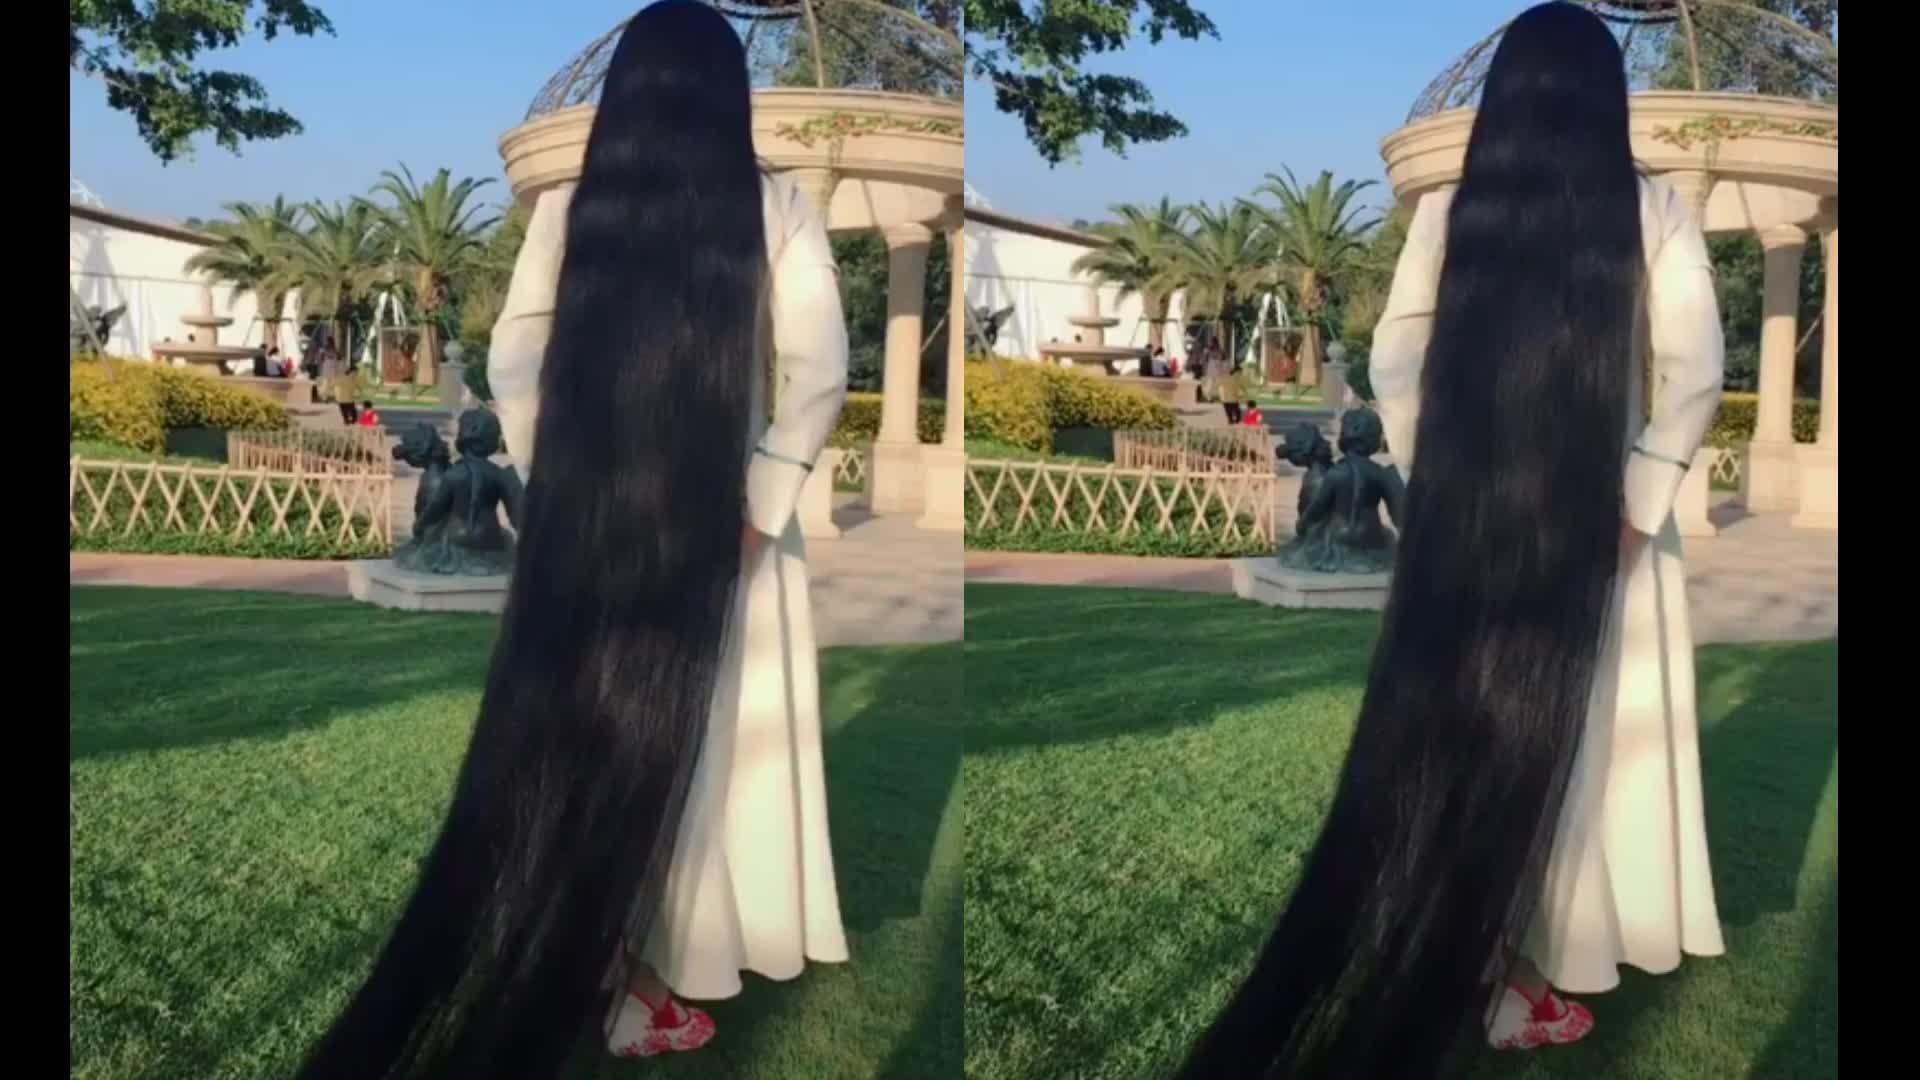 Wholesale natural free sample peruvian virgin hair,virgin 40 inch peruvian human hair dubai,unprocessed peruvian hair bundles